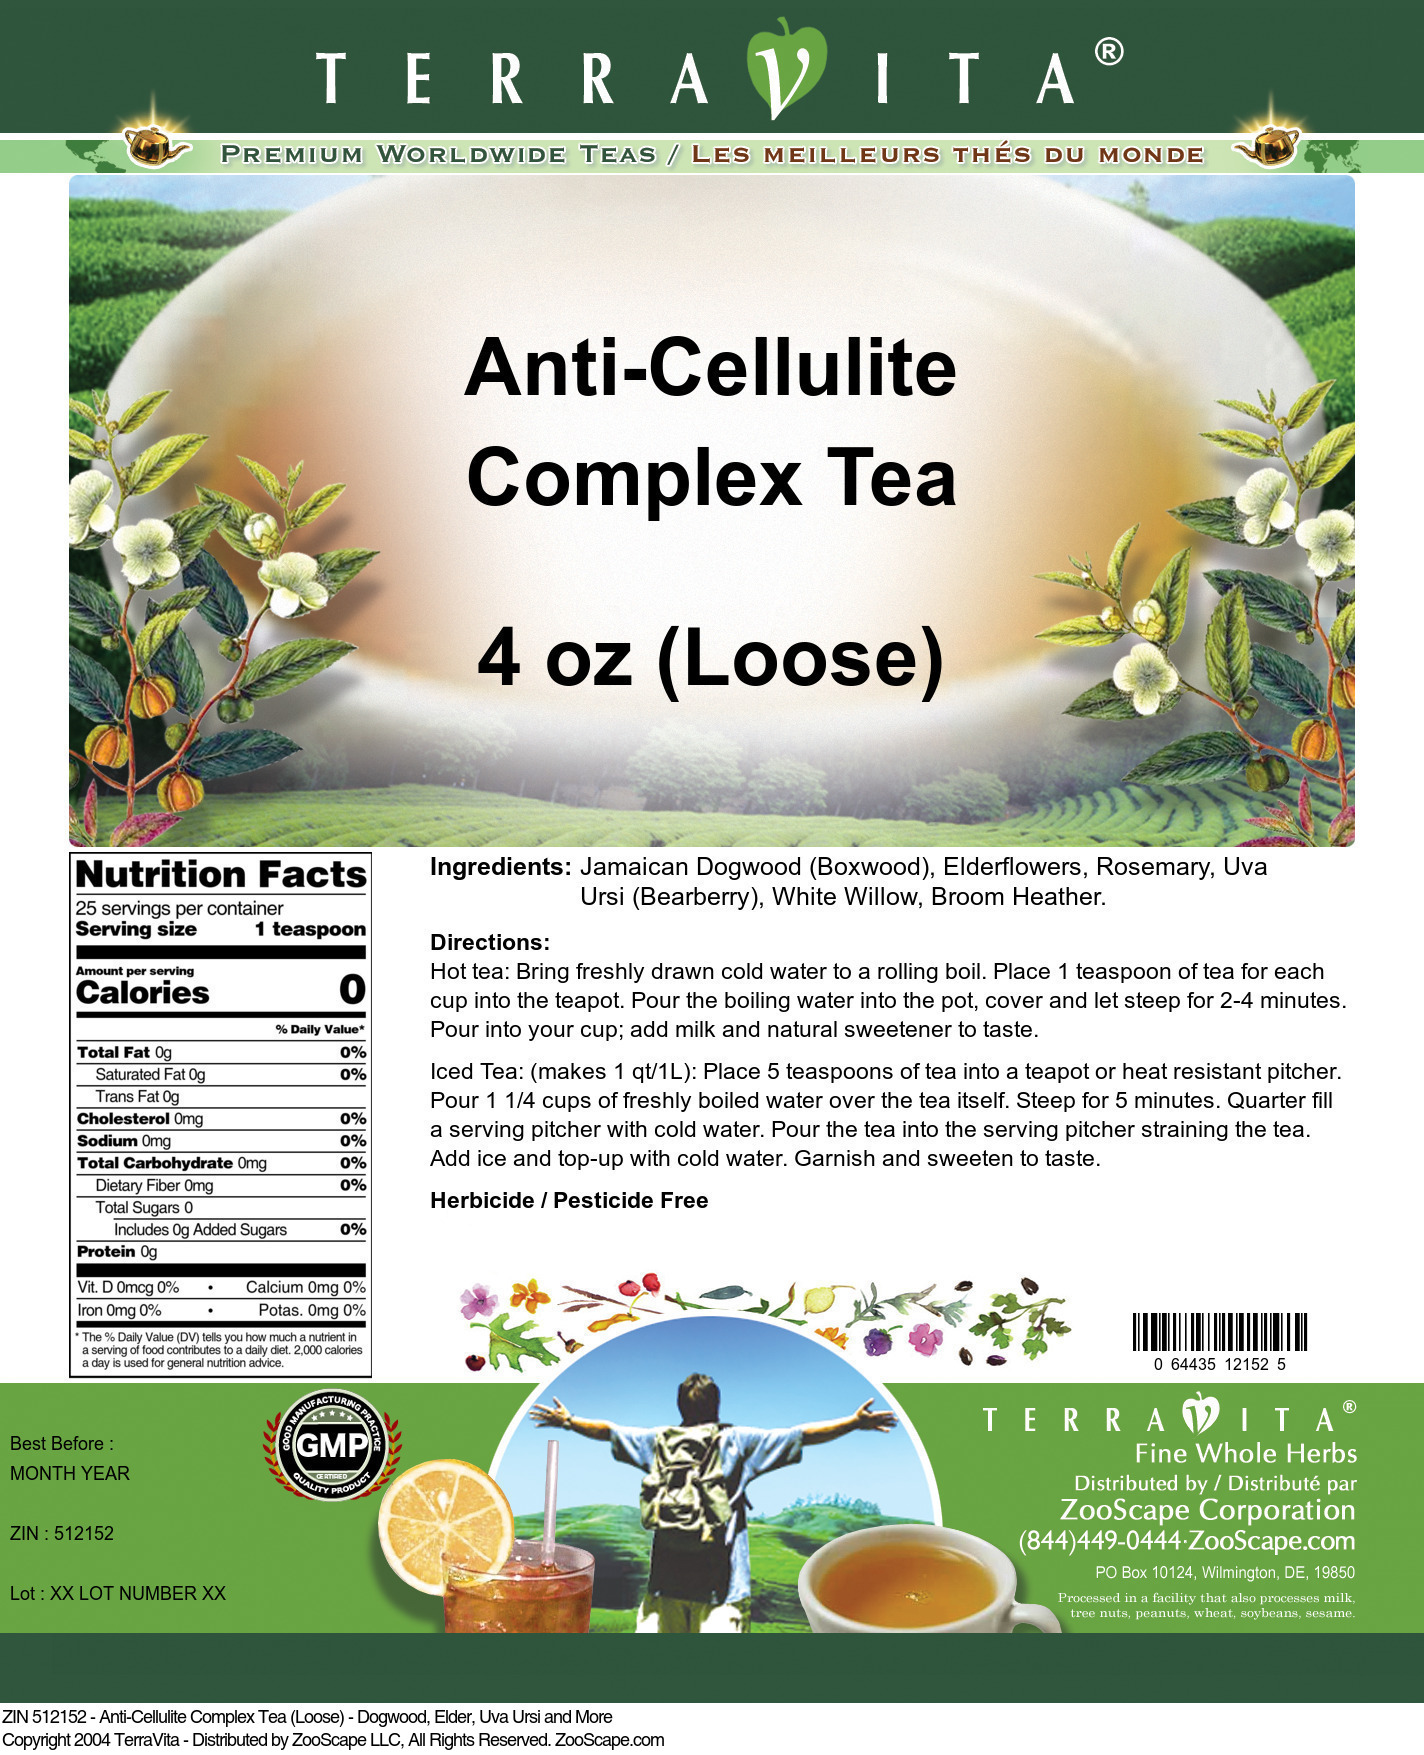 Anti-Cellulite Complex